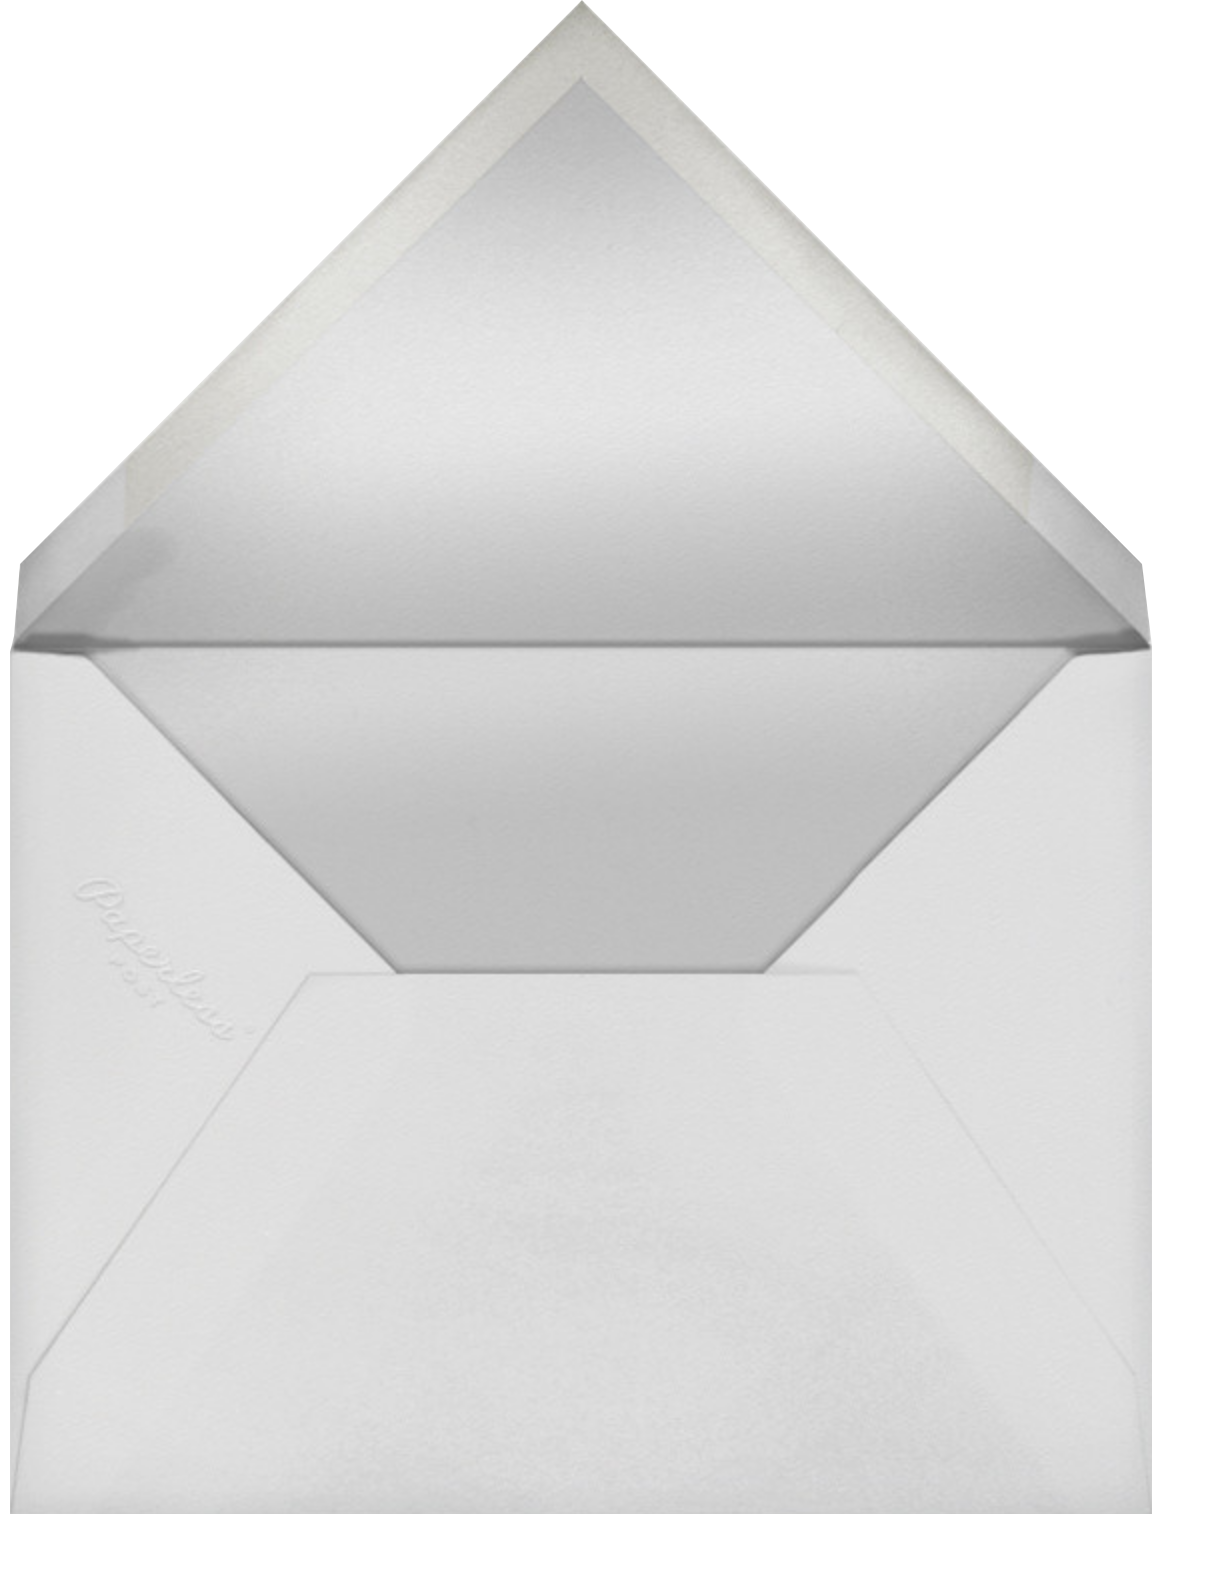 First Bloom - Meringue - Paperless Post - Baby shower - envelope back